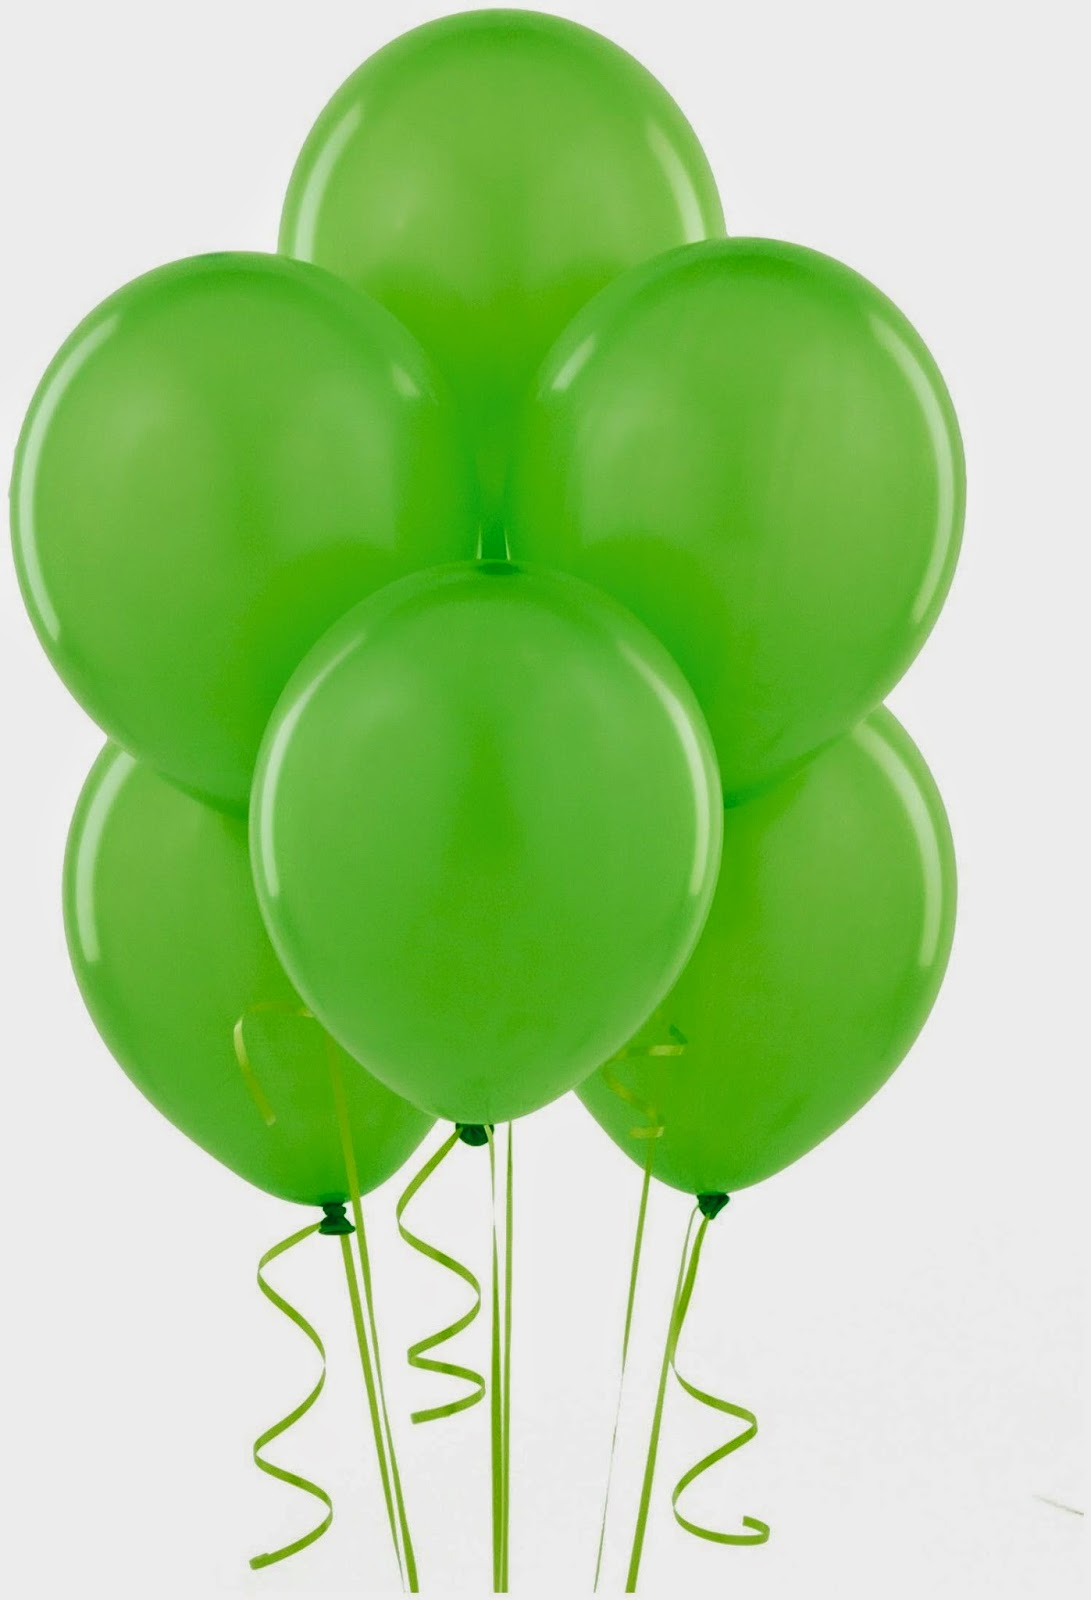 Green Balloon Decorations